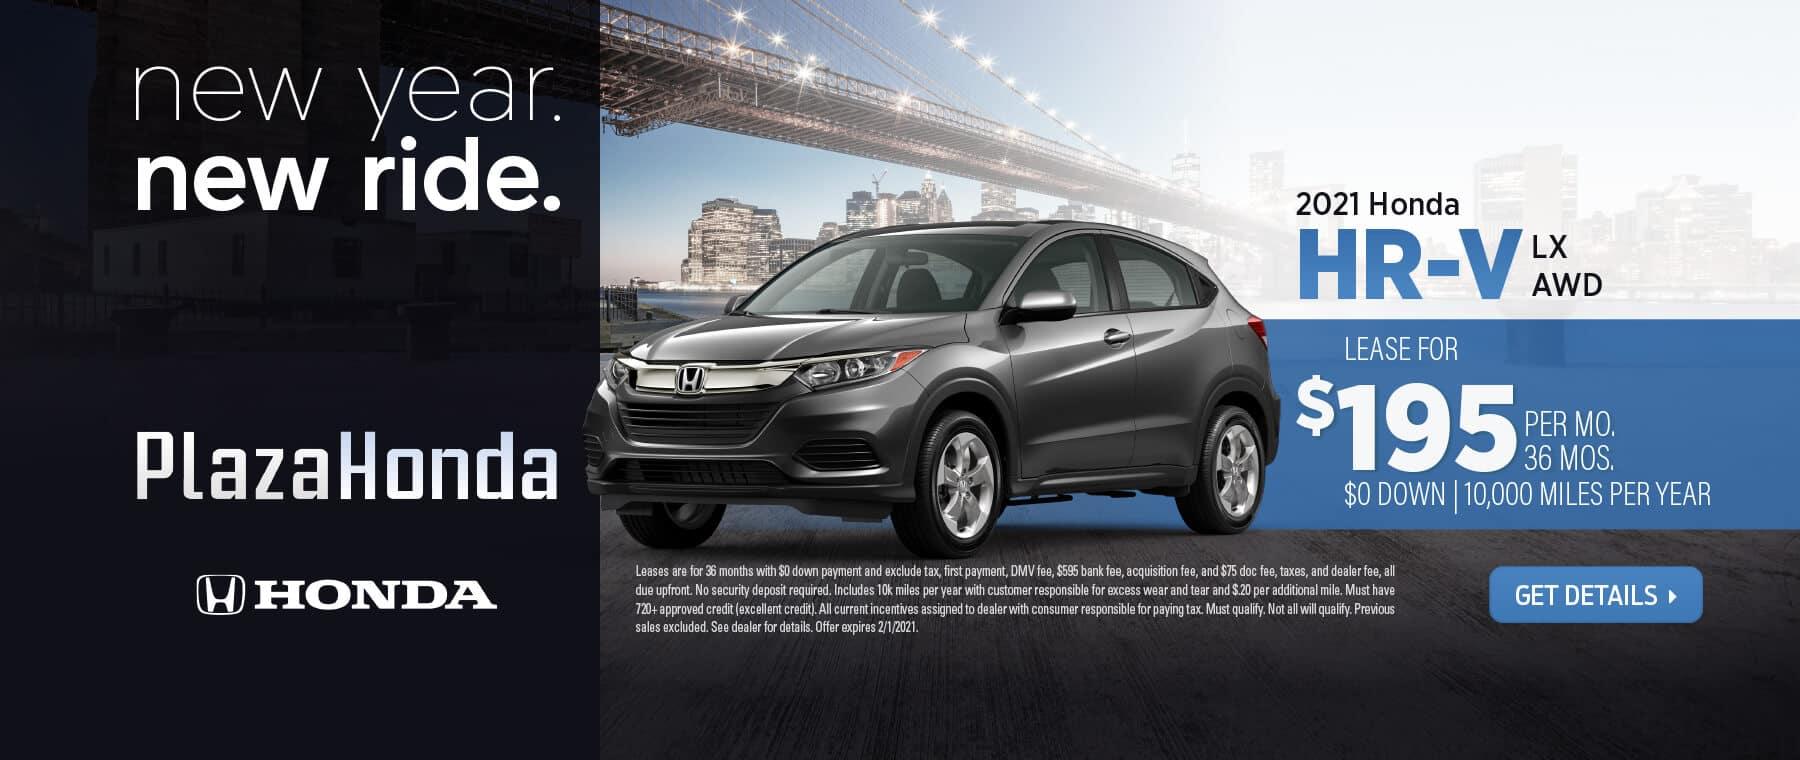 2021.01.08-Plaza-Honda-JAN-Web-2-S50293mr-3